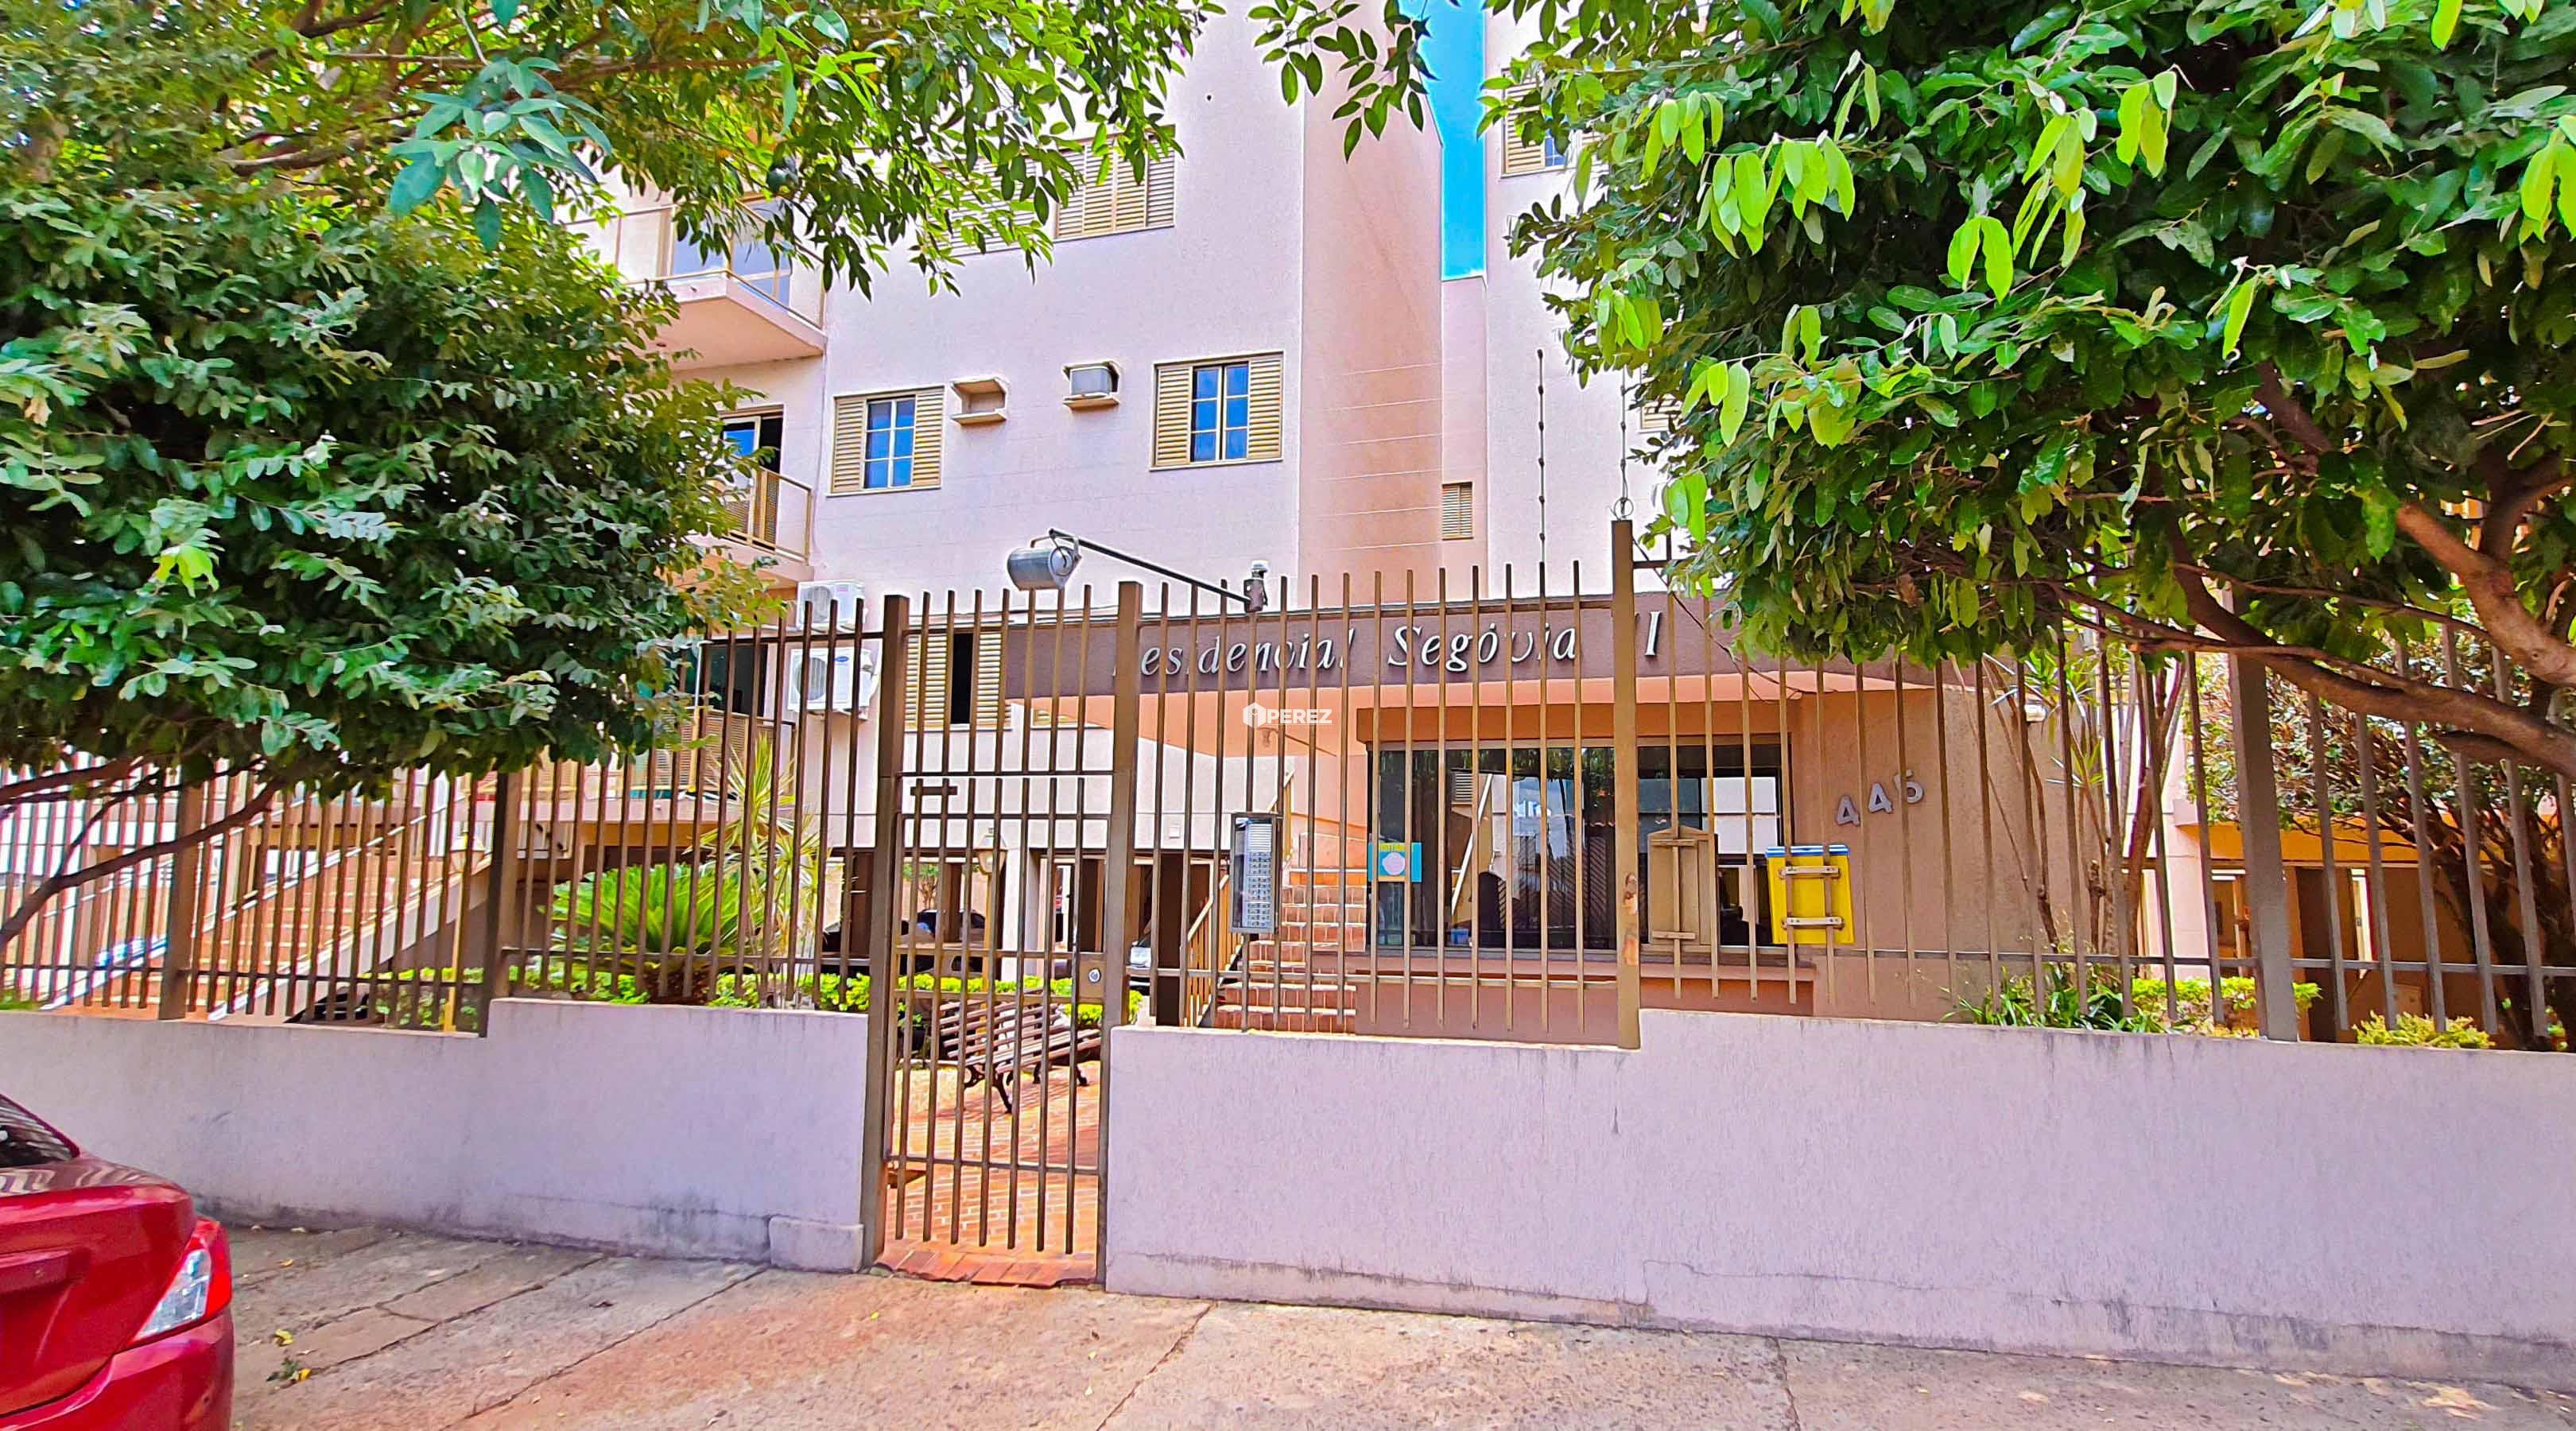 aluguel-campo-grande-ms-apartamento-xavier-de-toledo-vila-taquarussu-perez-imoveis